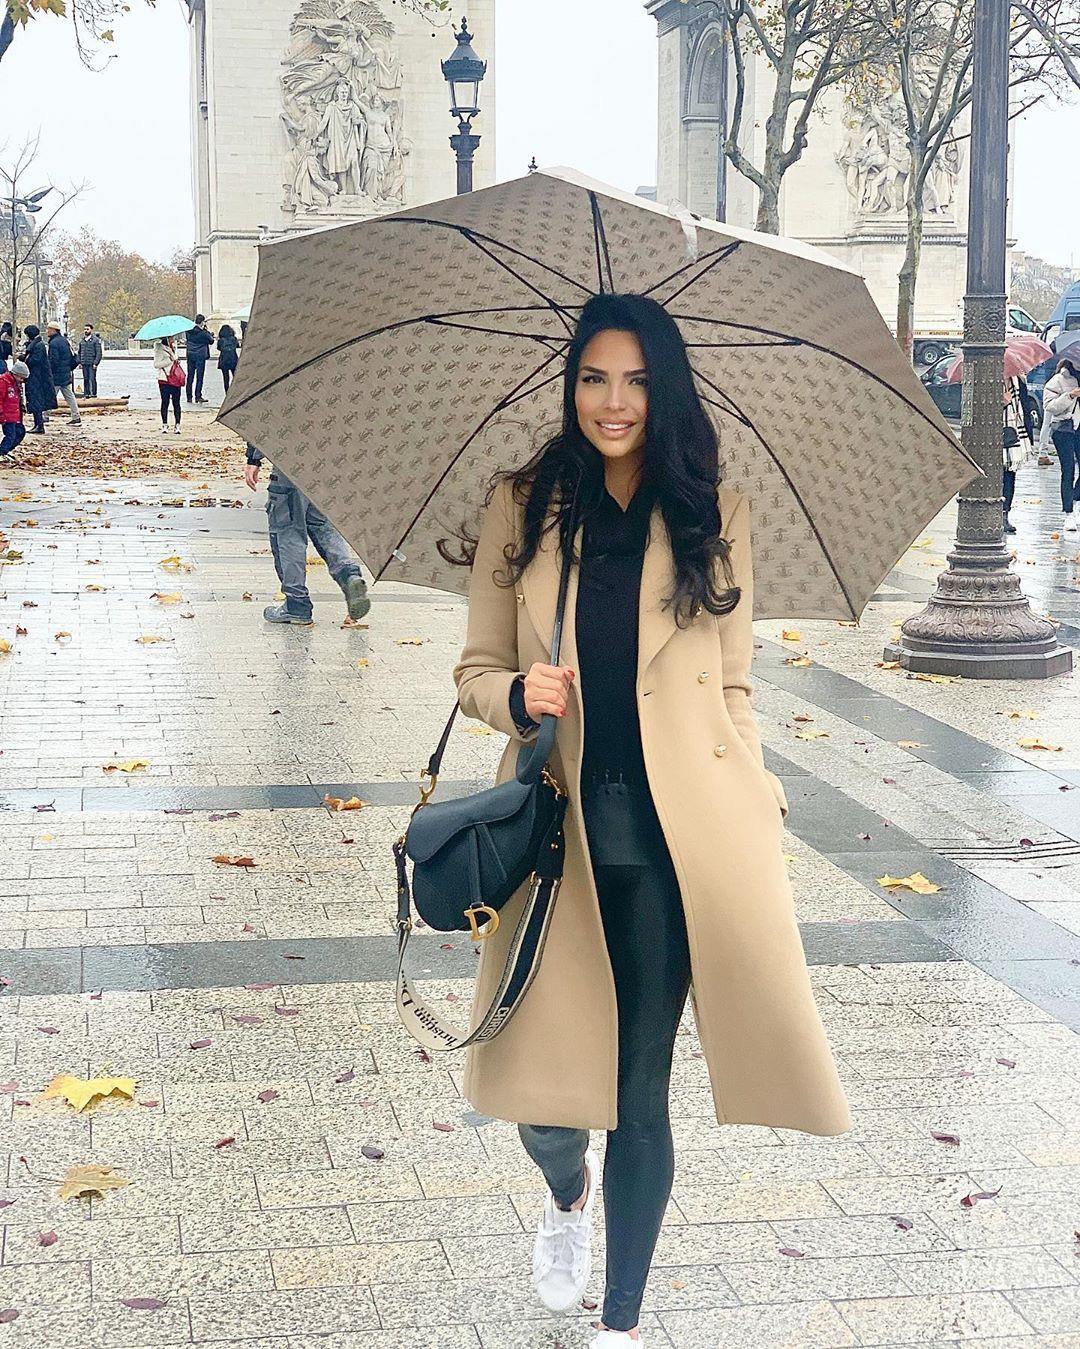 Shadi Y Cair trench coat, coat dresses ideas, photography ideas